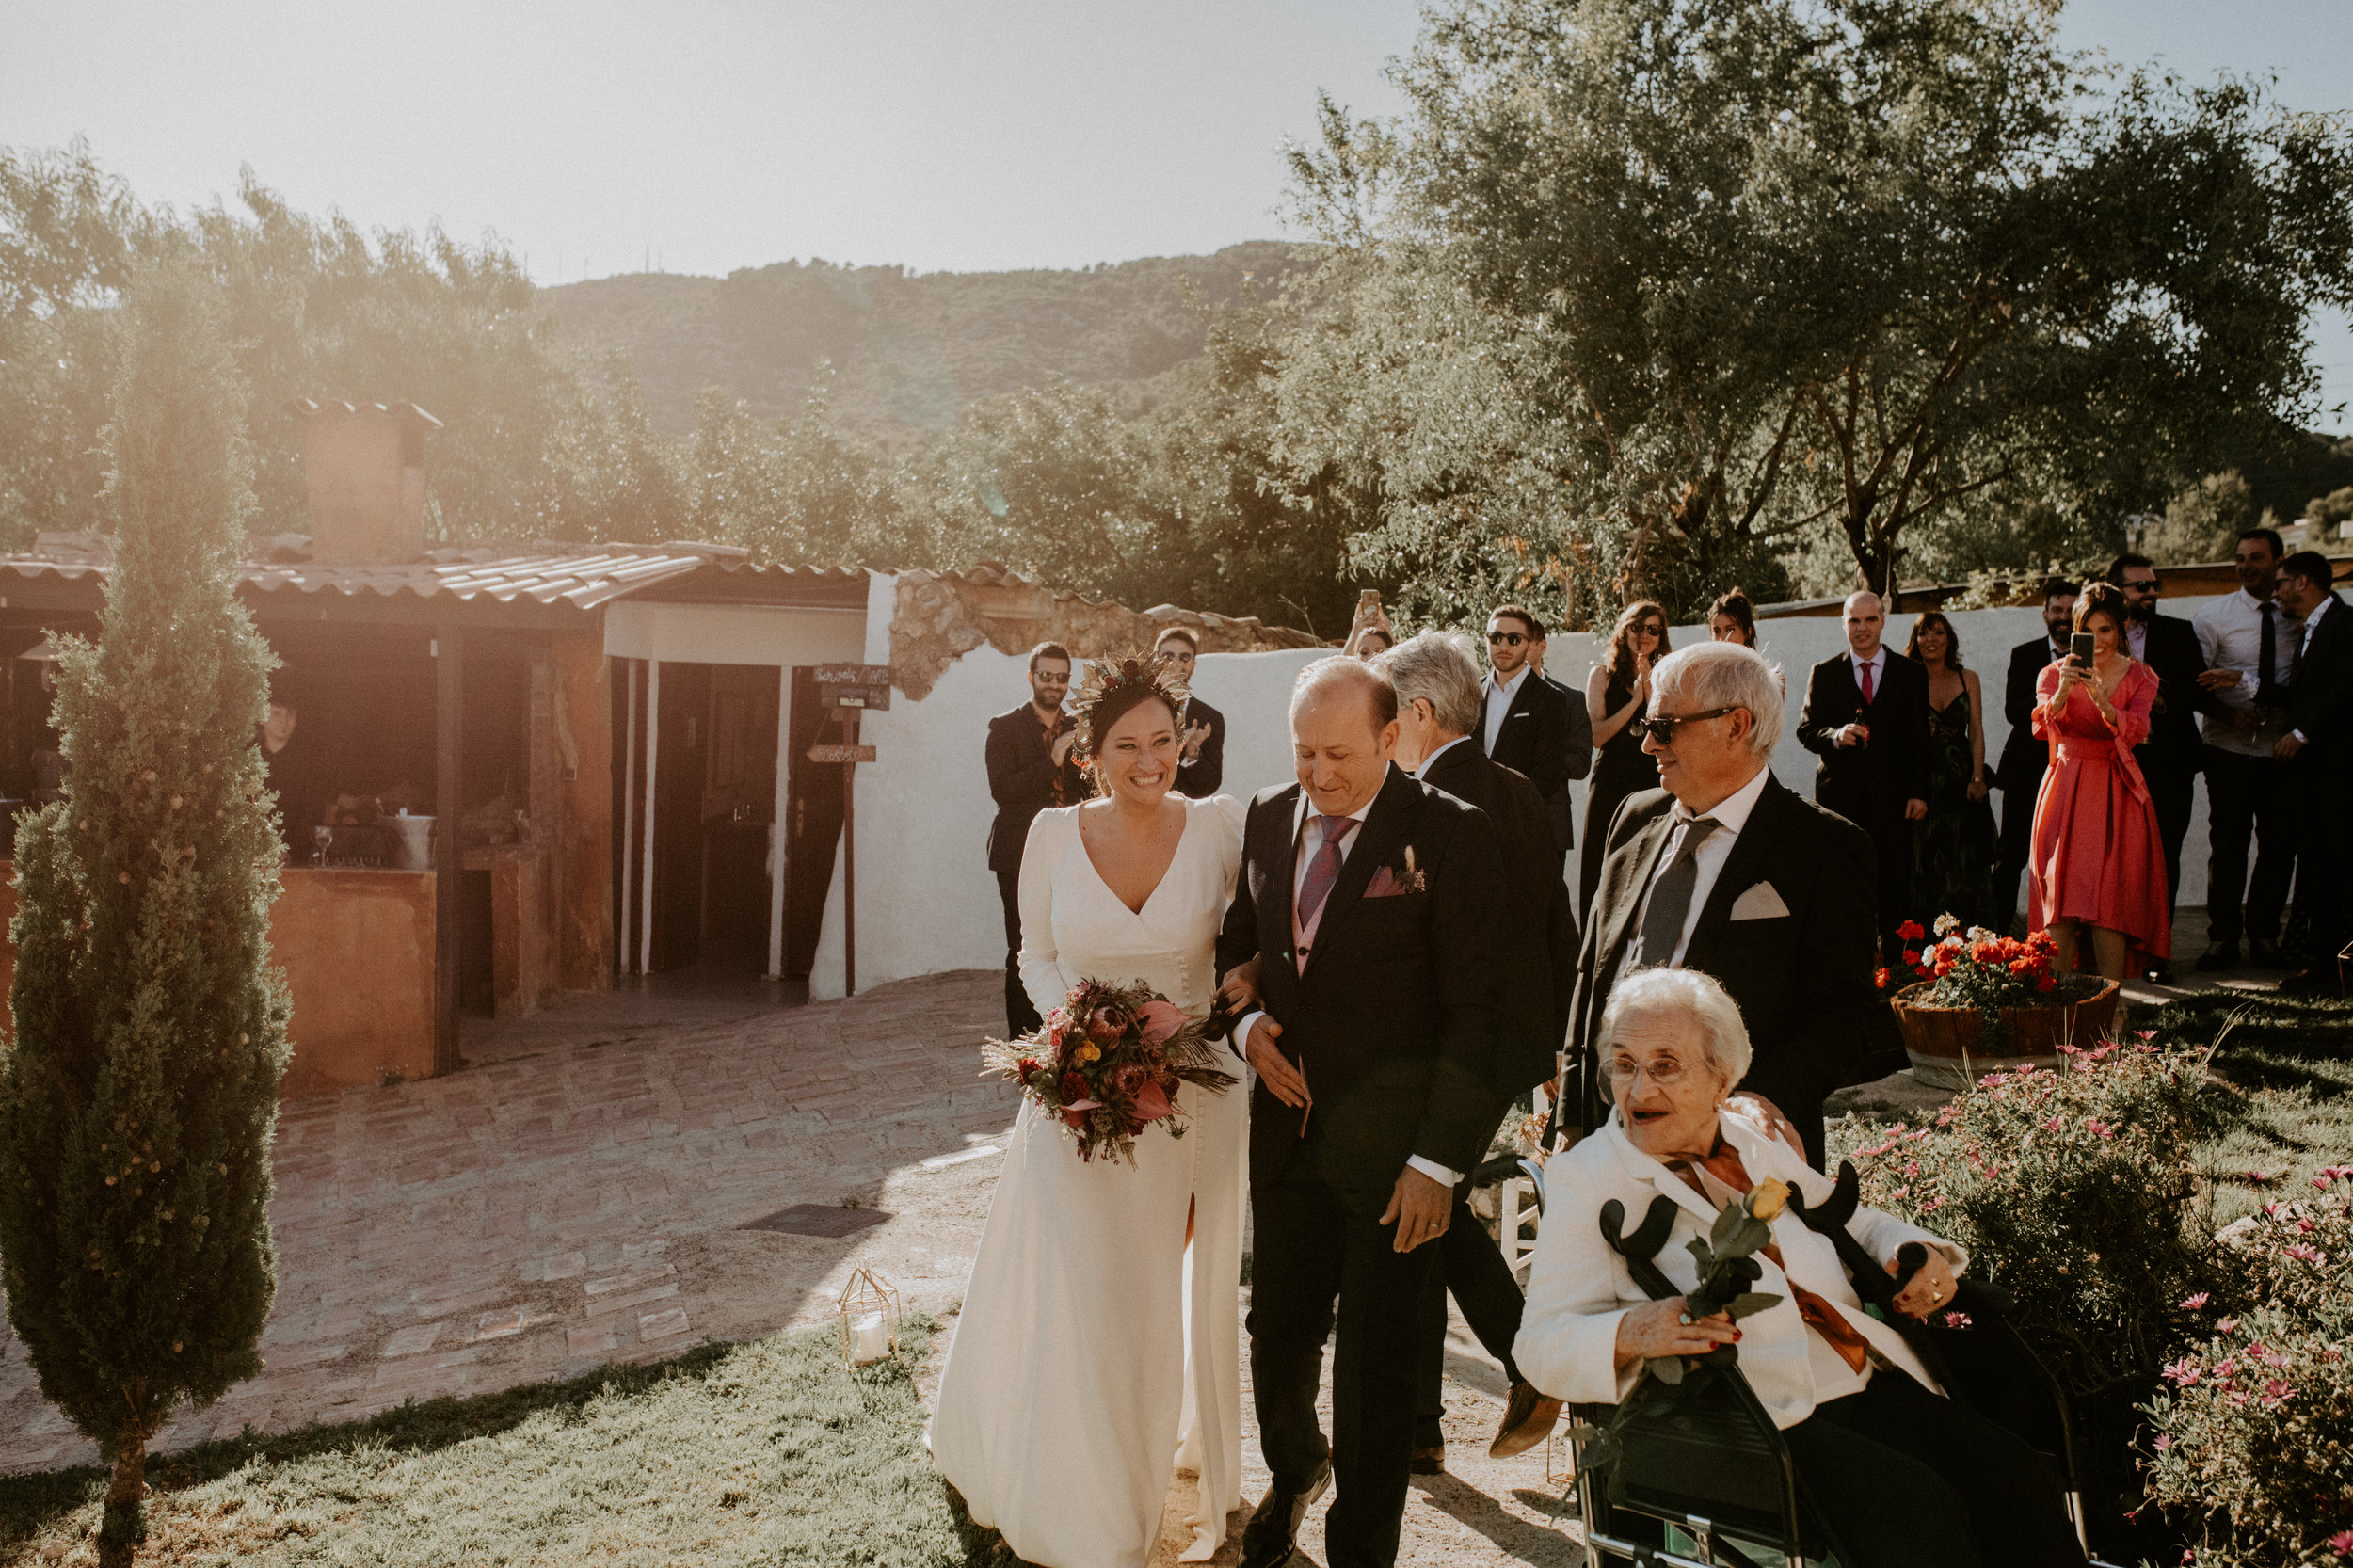 thenortherngirlphotography-fotografa-de-bodas-barcelona_destinartion-wedding-photographer_wedding-photographer_moroccan-wedding_HADNANANTIGONA-417.jpg